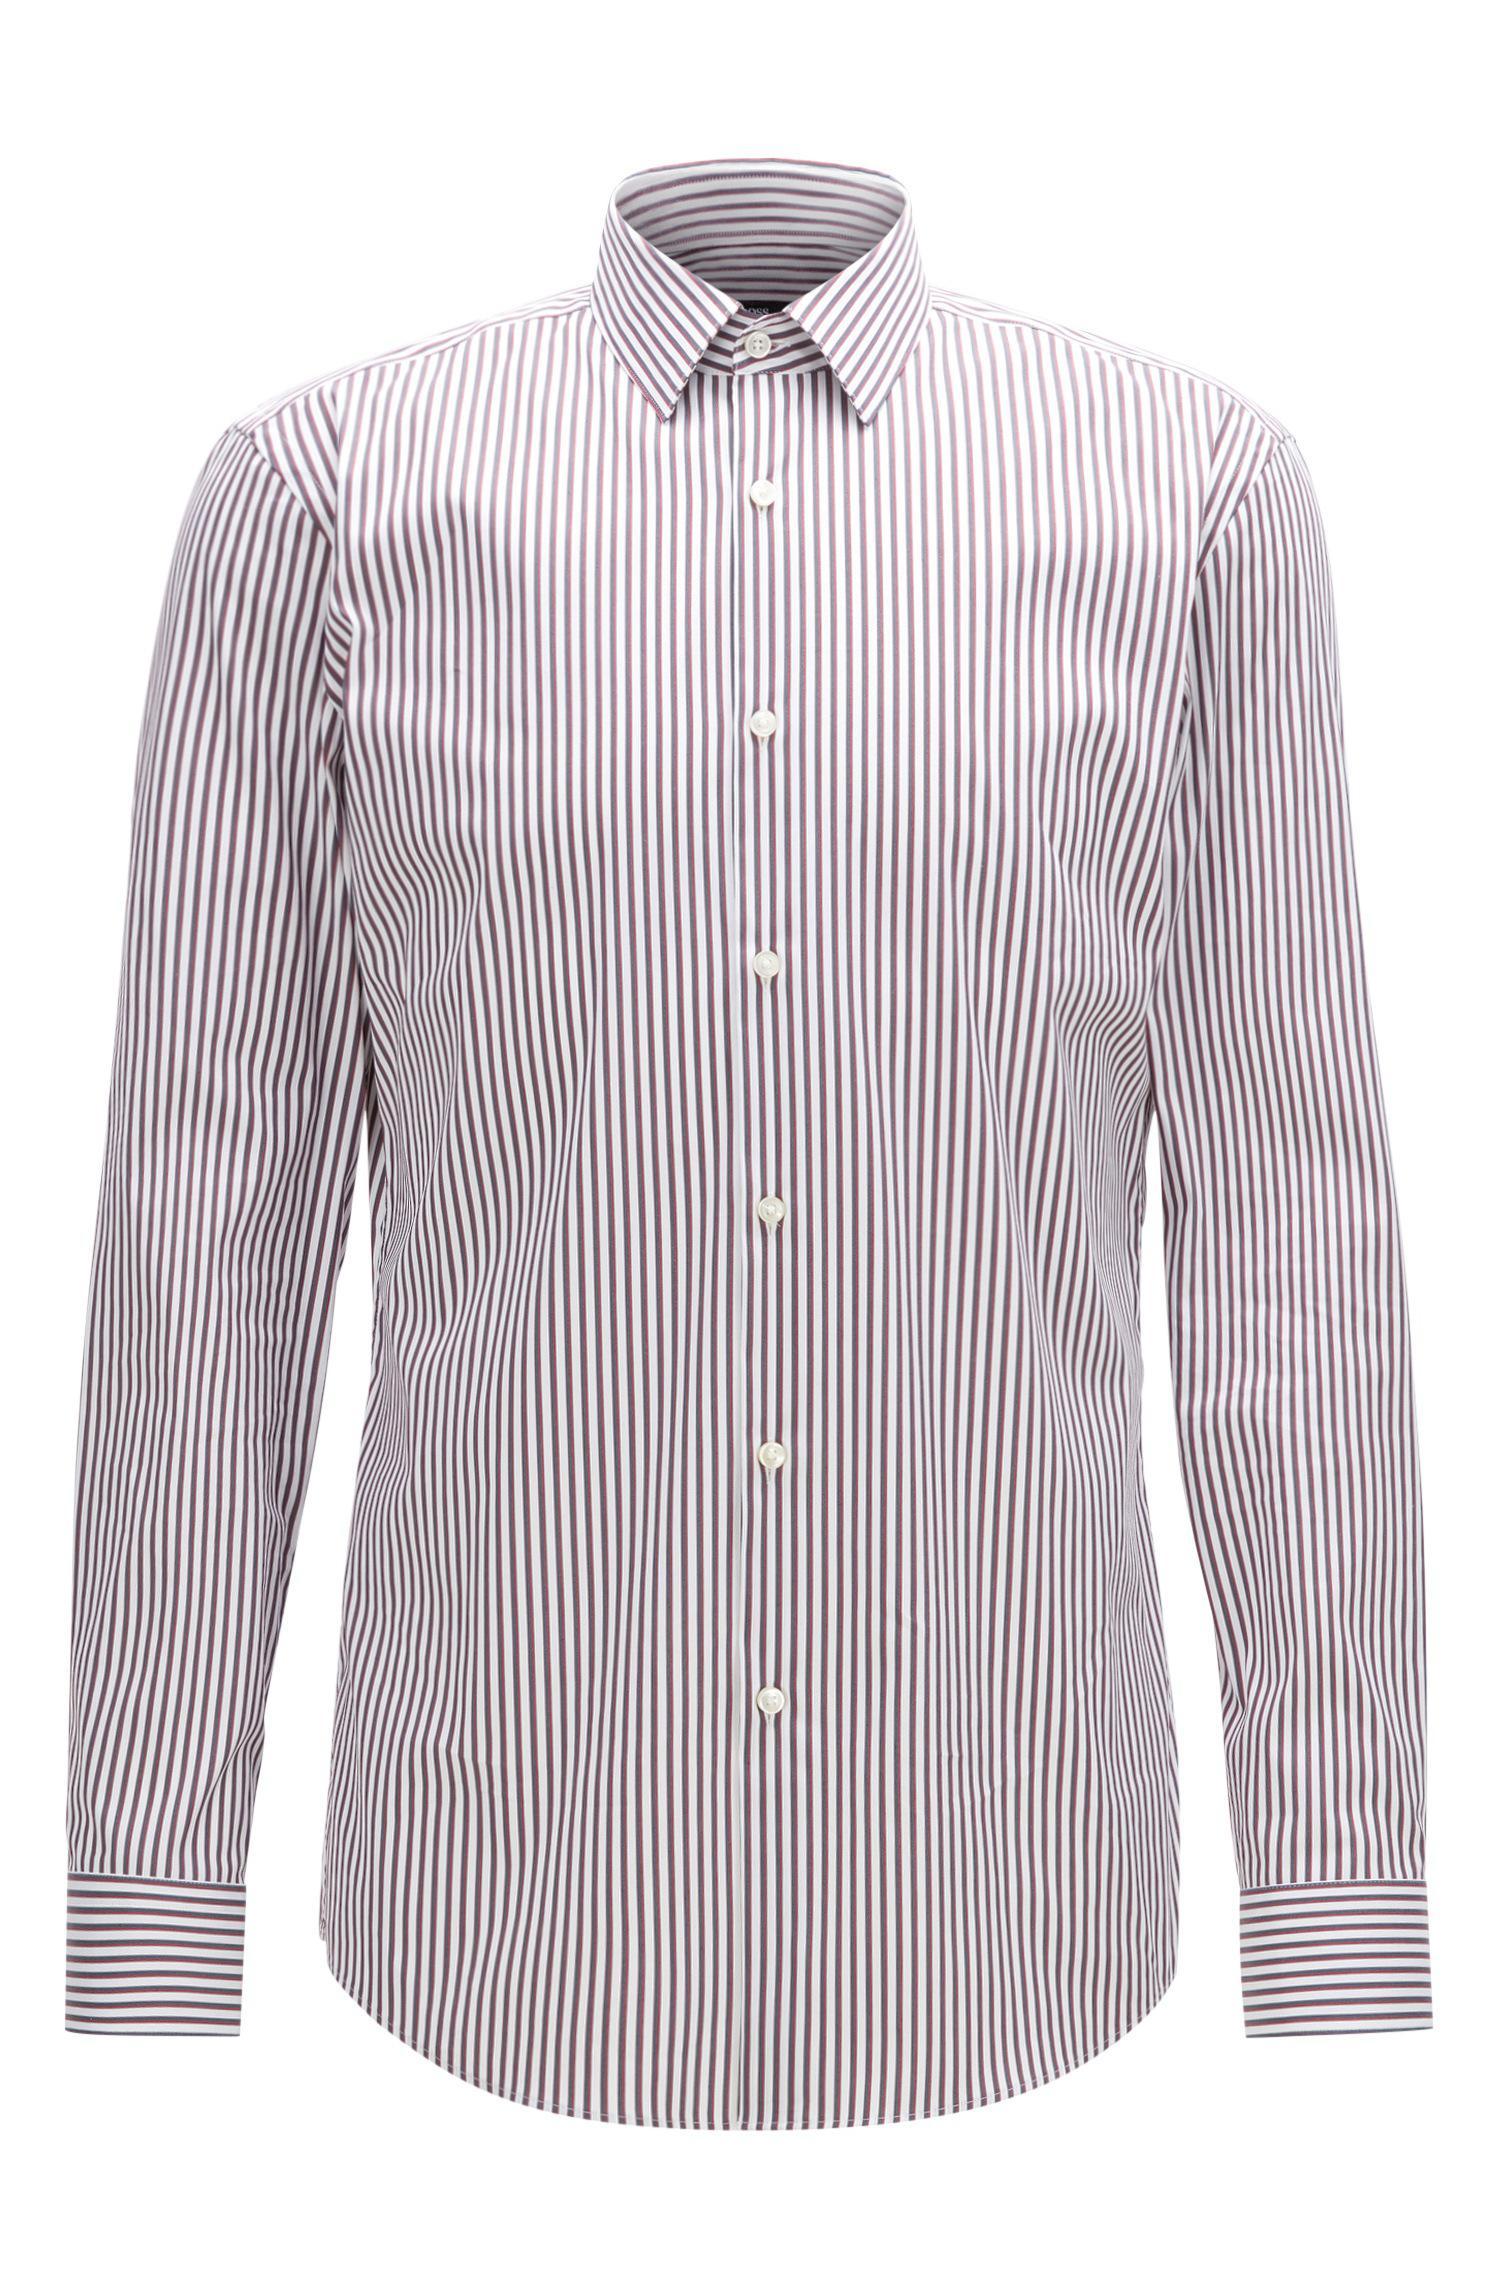 510fbfb3 Lyst - BOSS Striped Stretch Cotton Dress Shirt, Slim Fit | Isko in ...